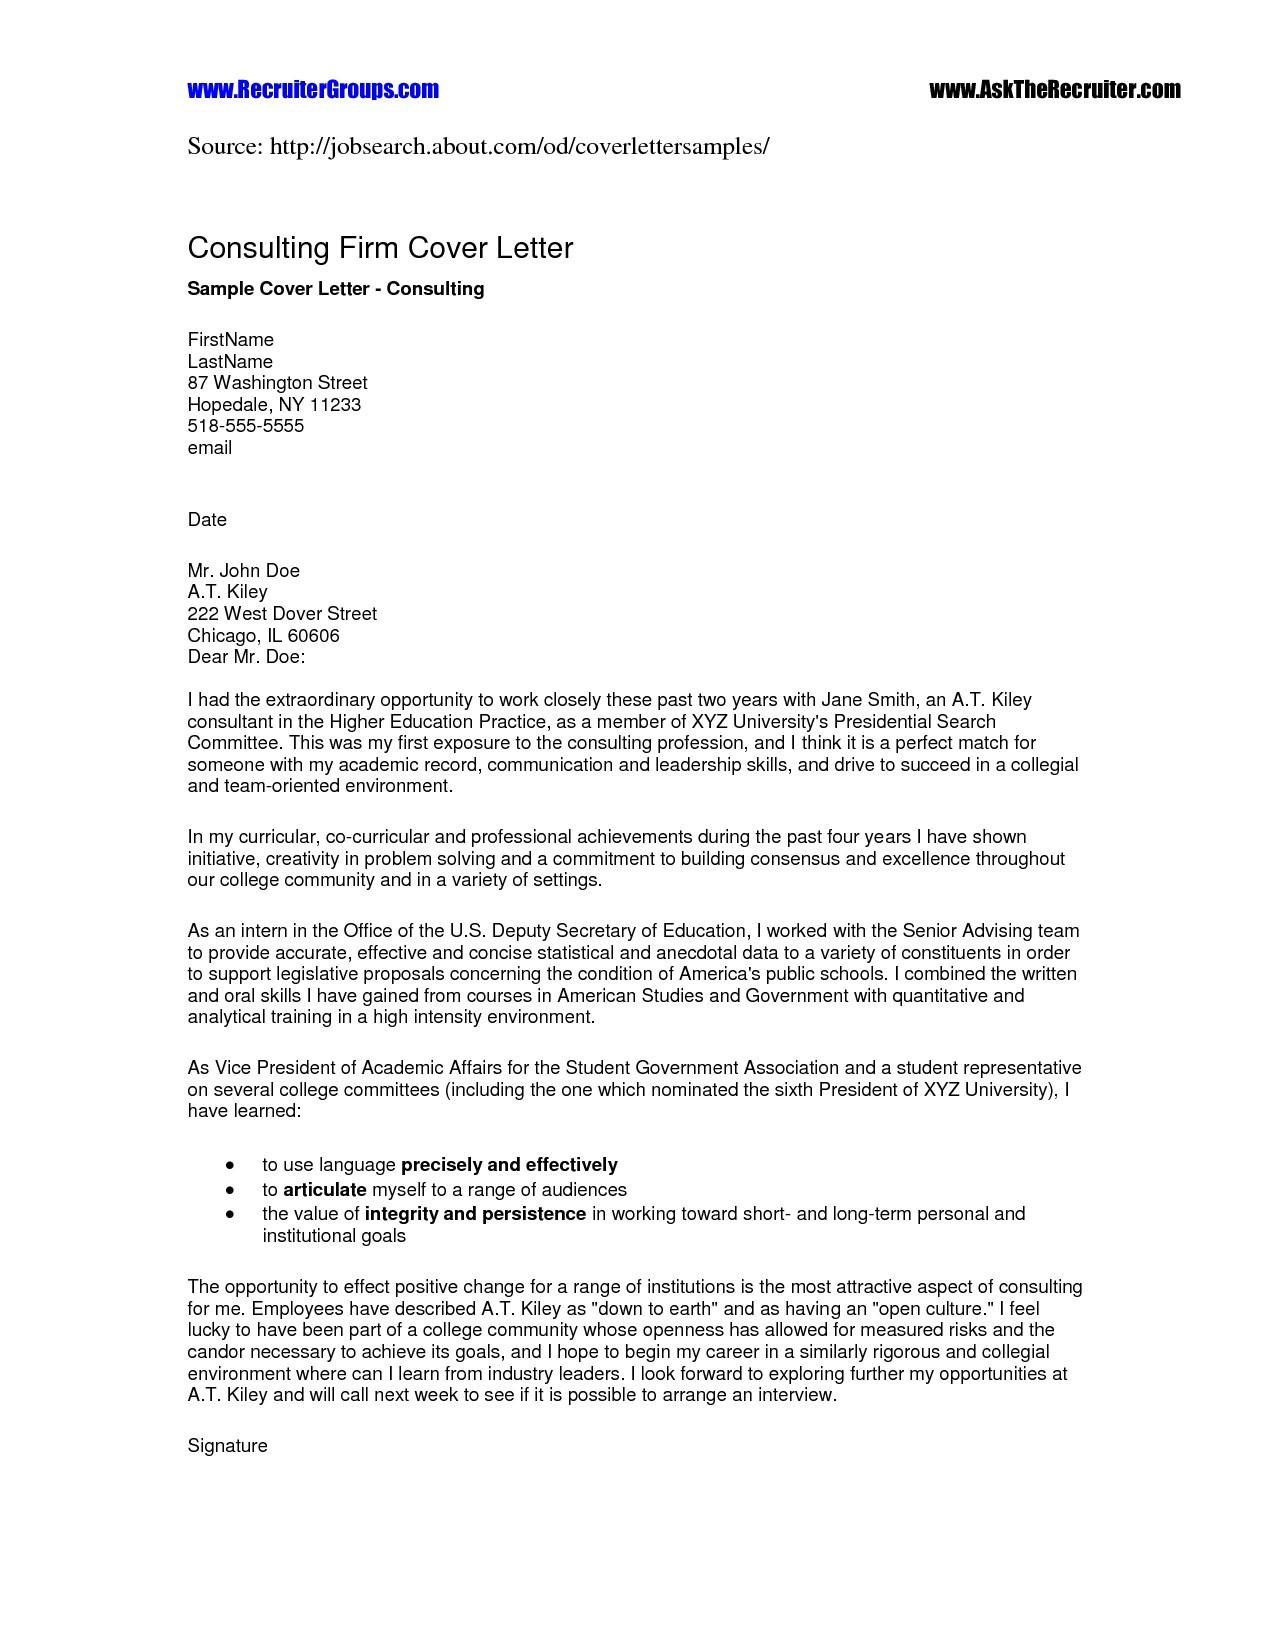 letter of recommendation for residency template Collection-Template For Re mendation Letter Free Creative Re Mendation Letter Template Medical Residency Copy Sample Medical 14-g